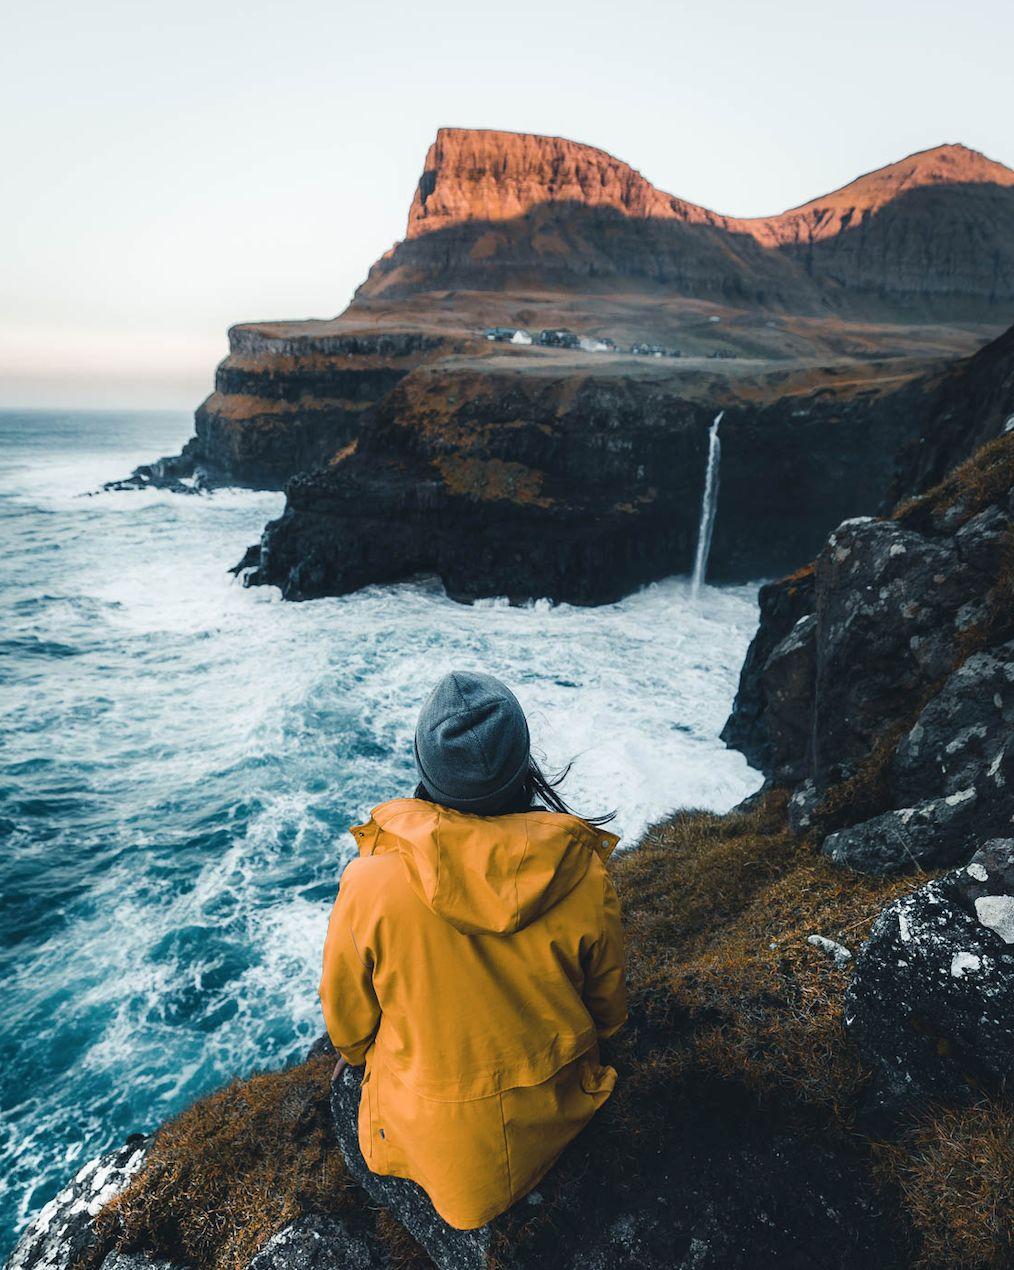 The Atlantic crashing against the cliffs